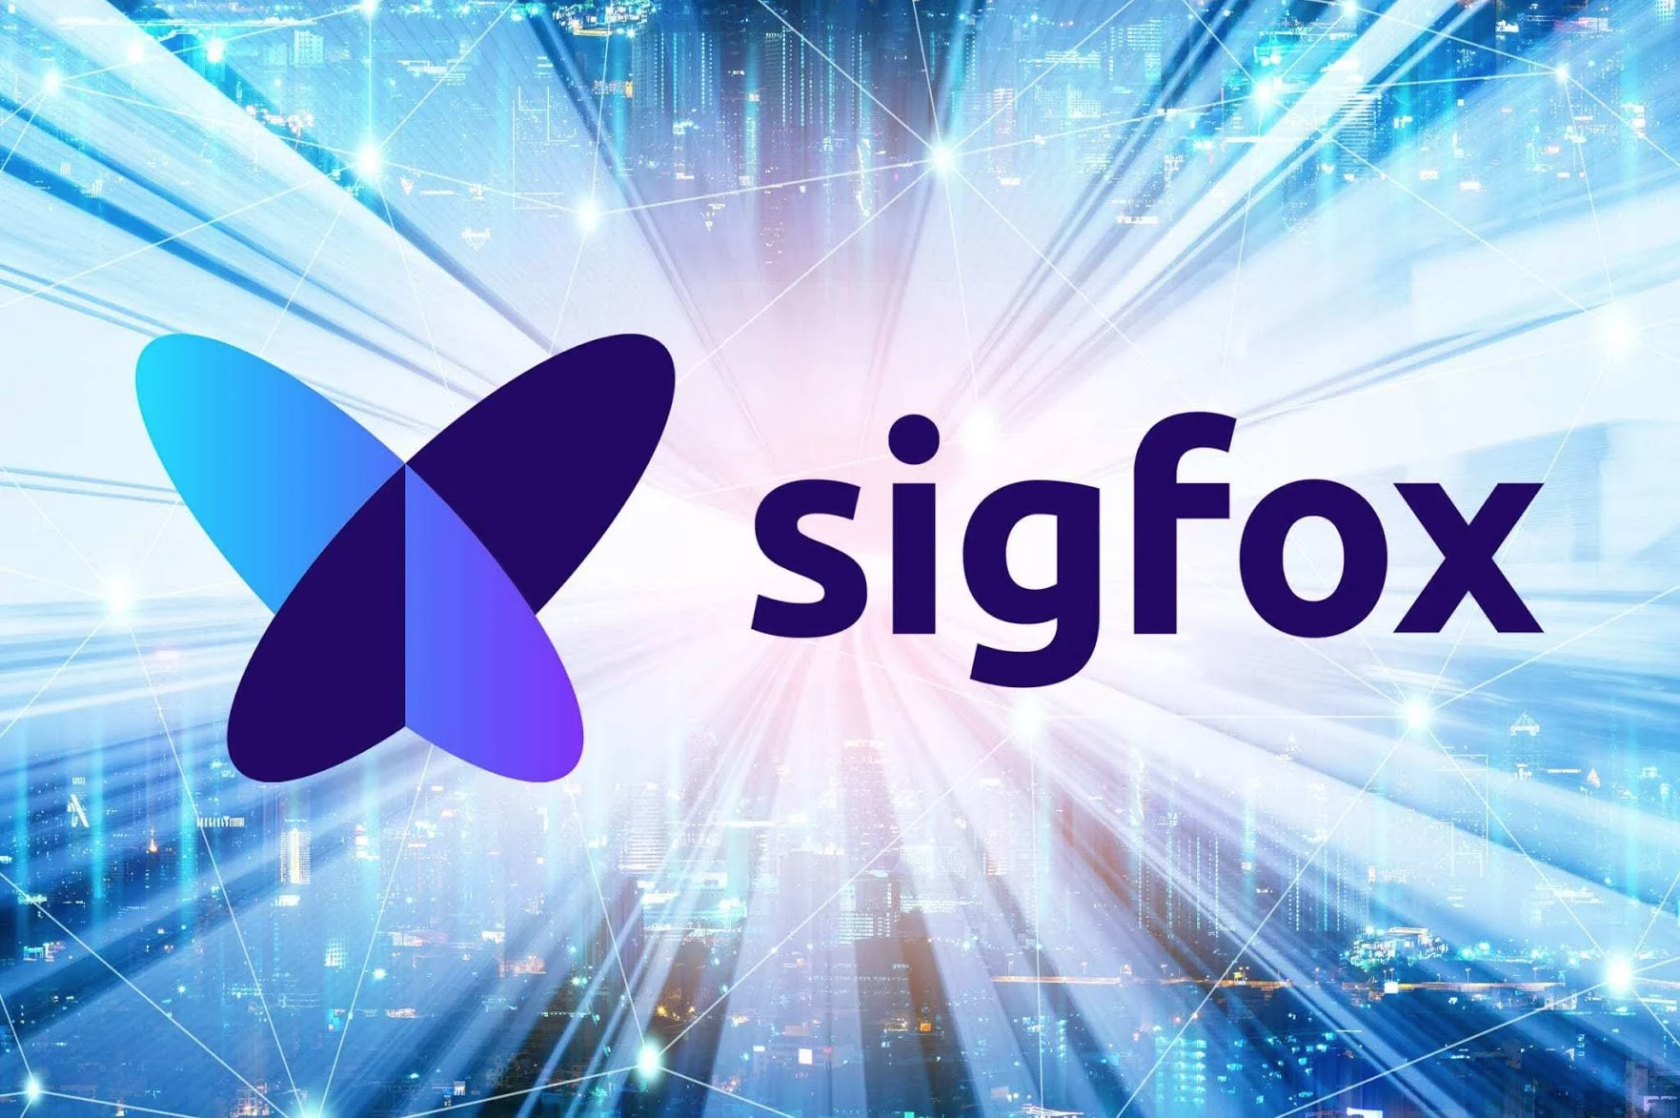 Sigfox prepara rastreadores de un dólar para contratos masivos de cadenas de suministro